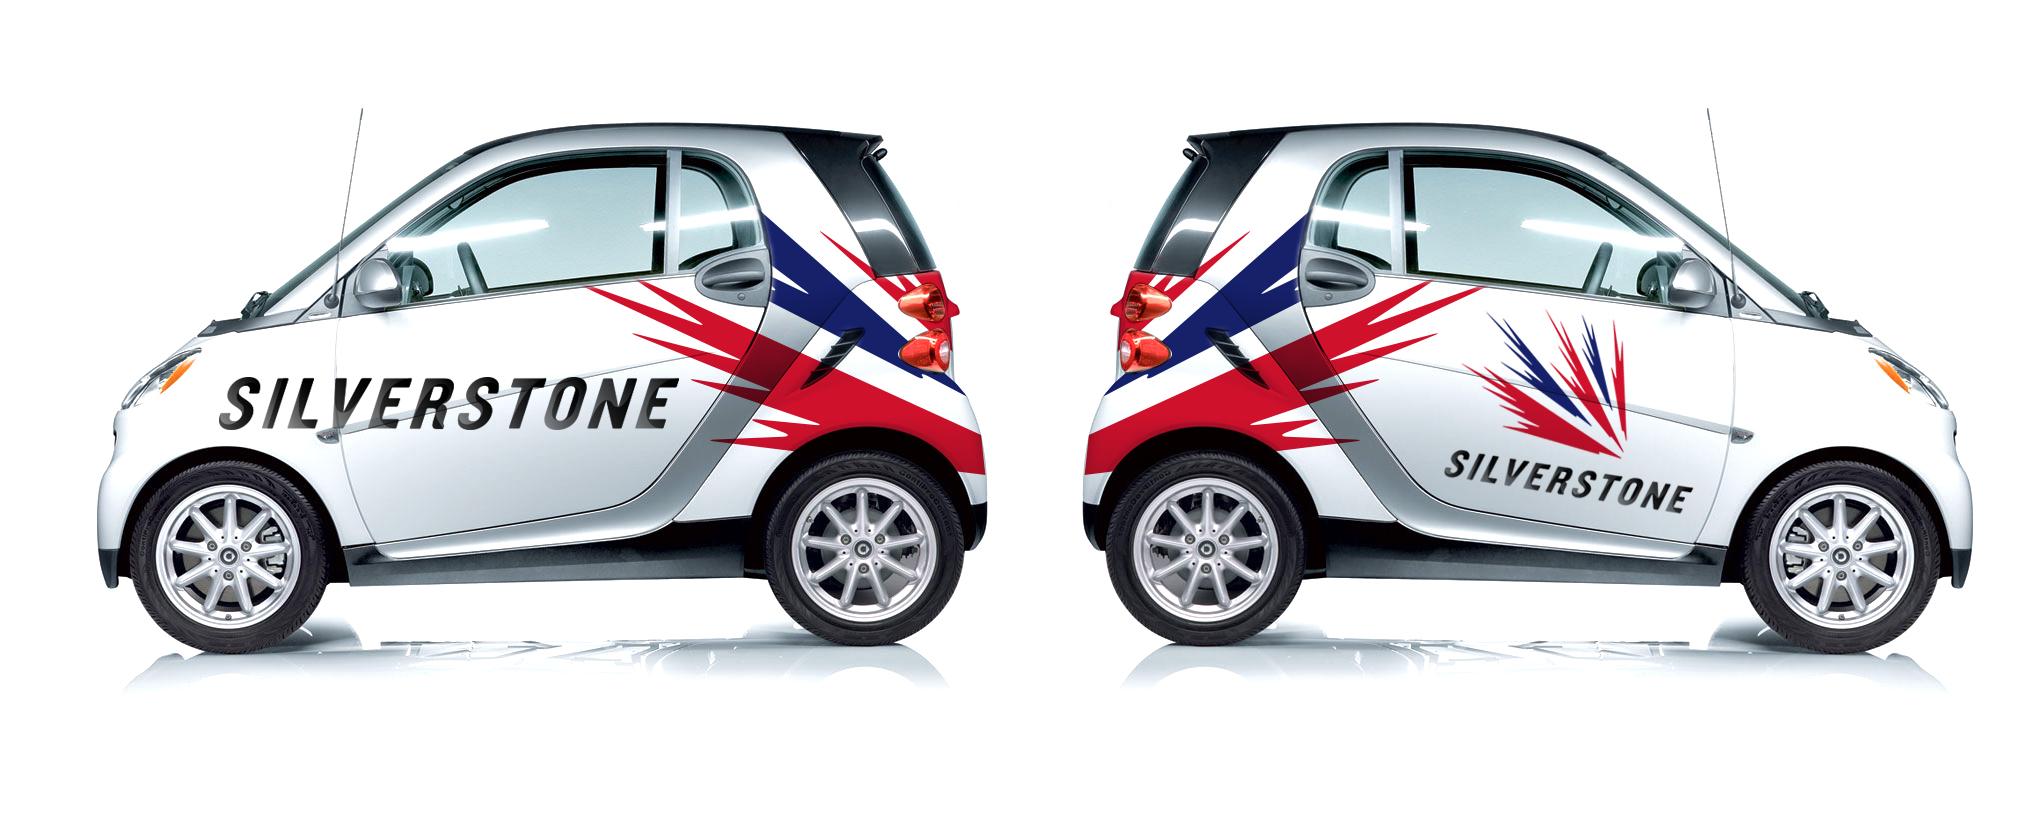 Silverstone car